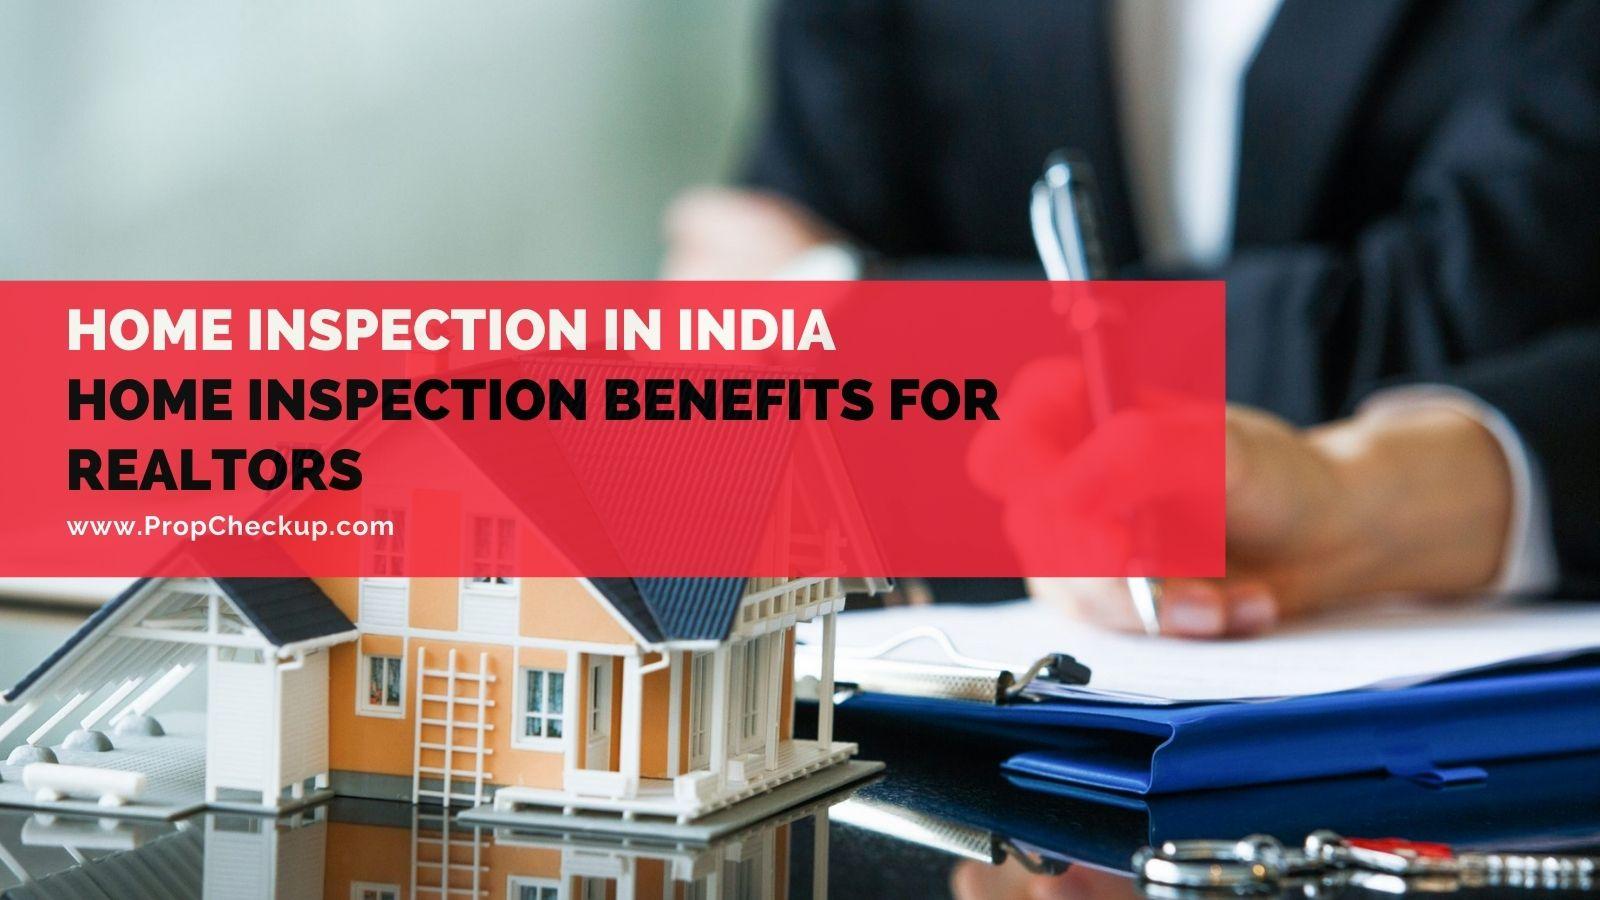 Home Inspection benefits for realtors